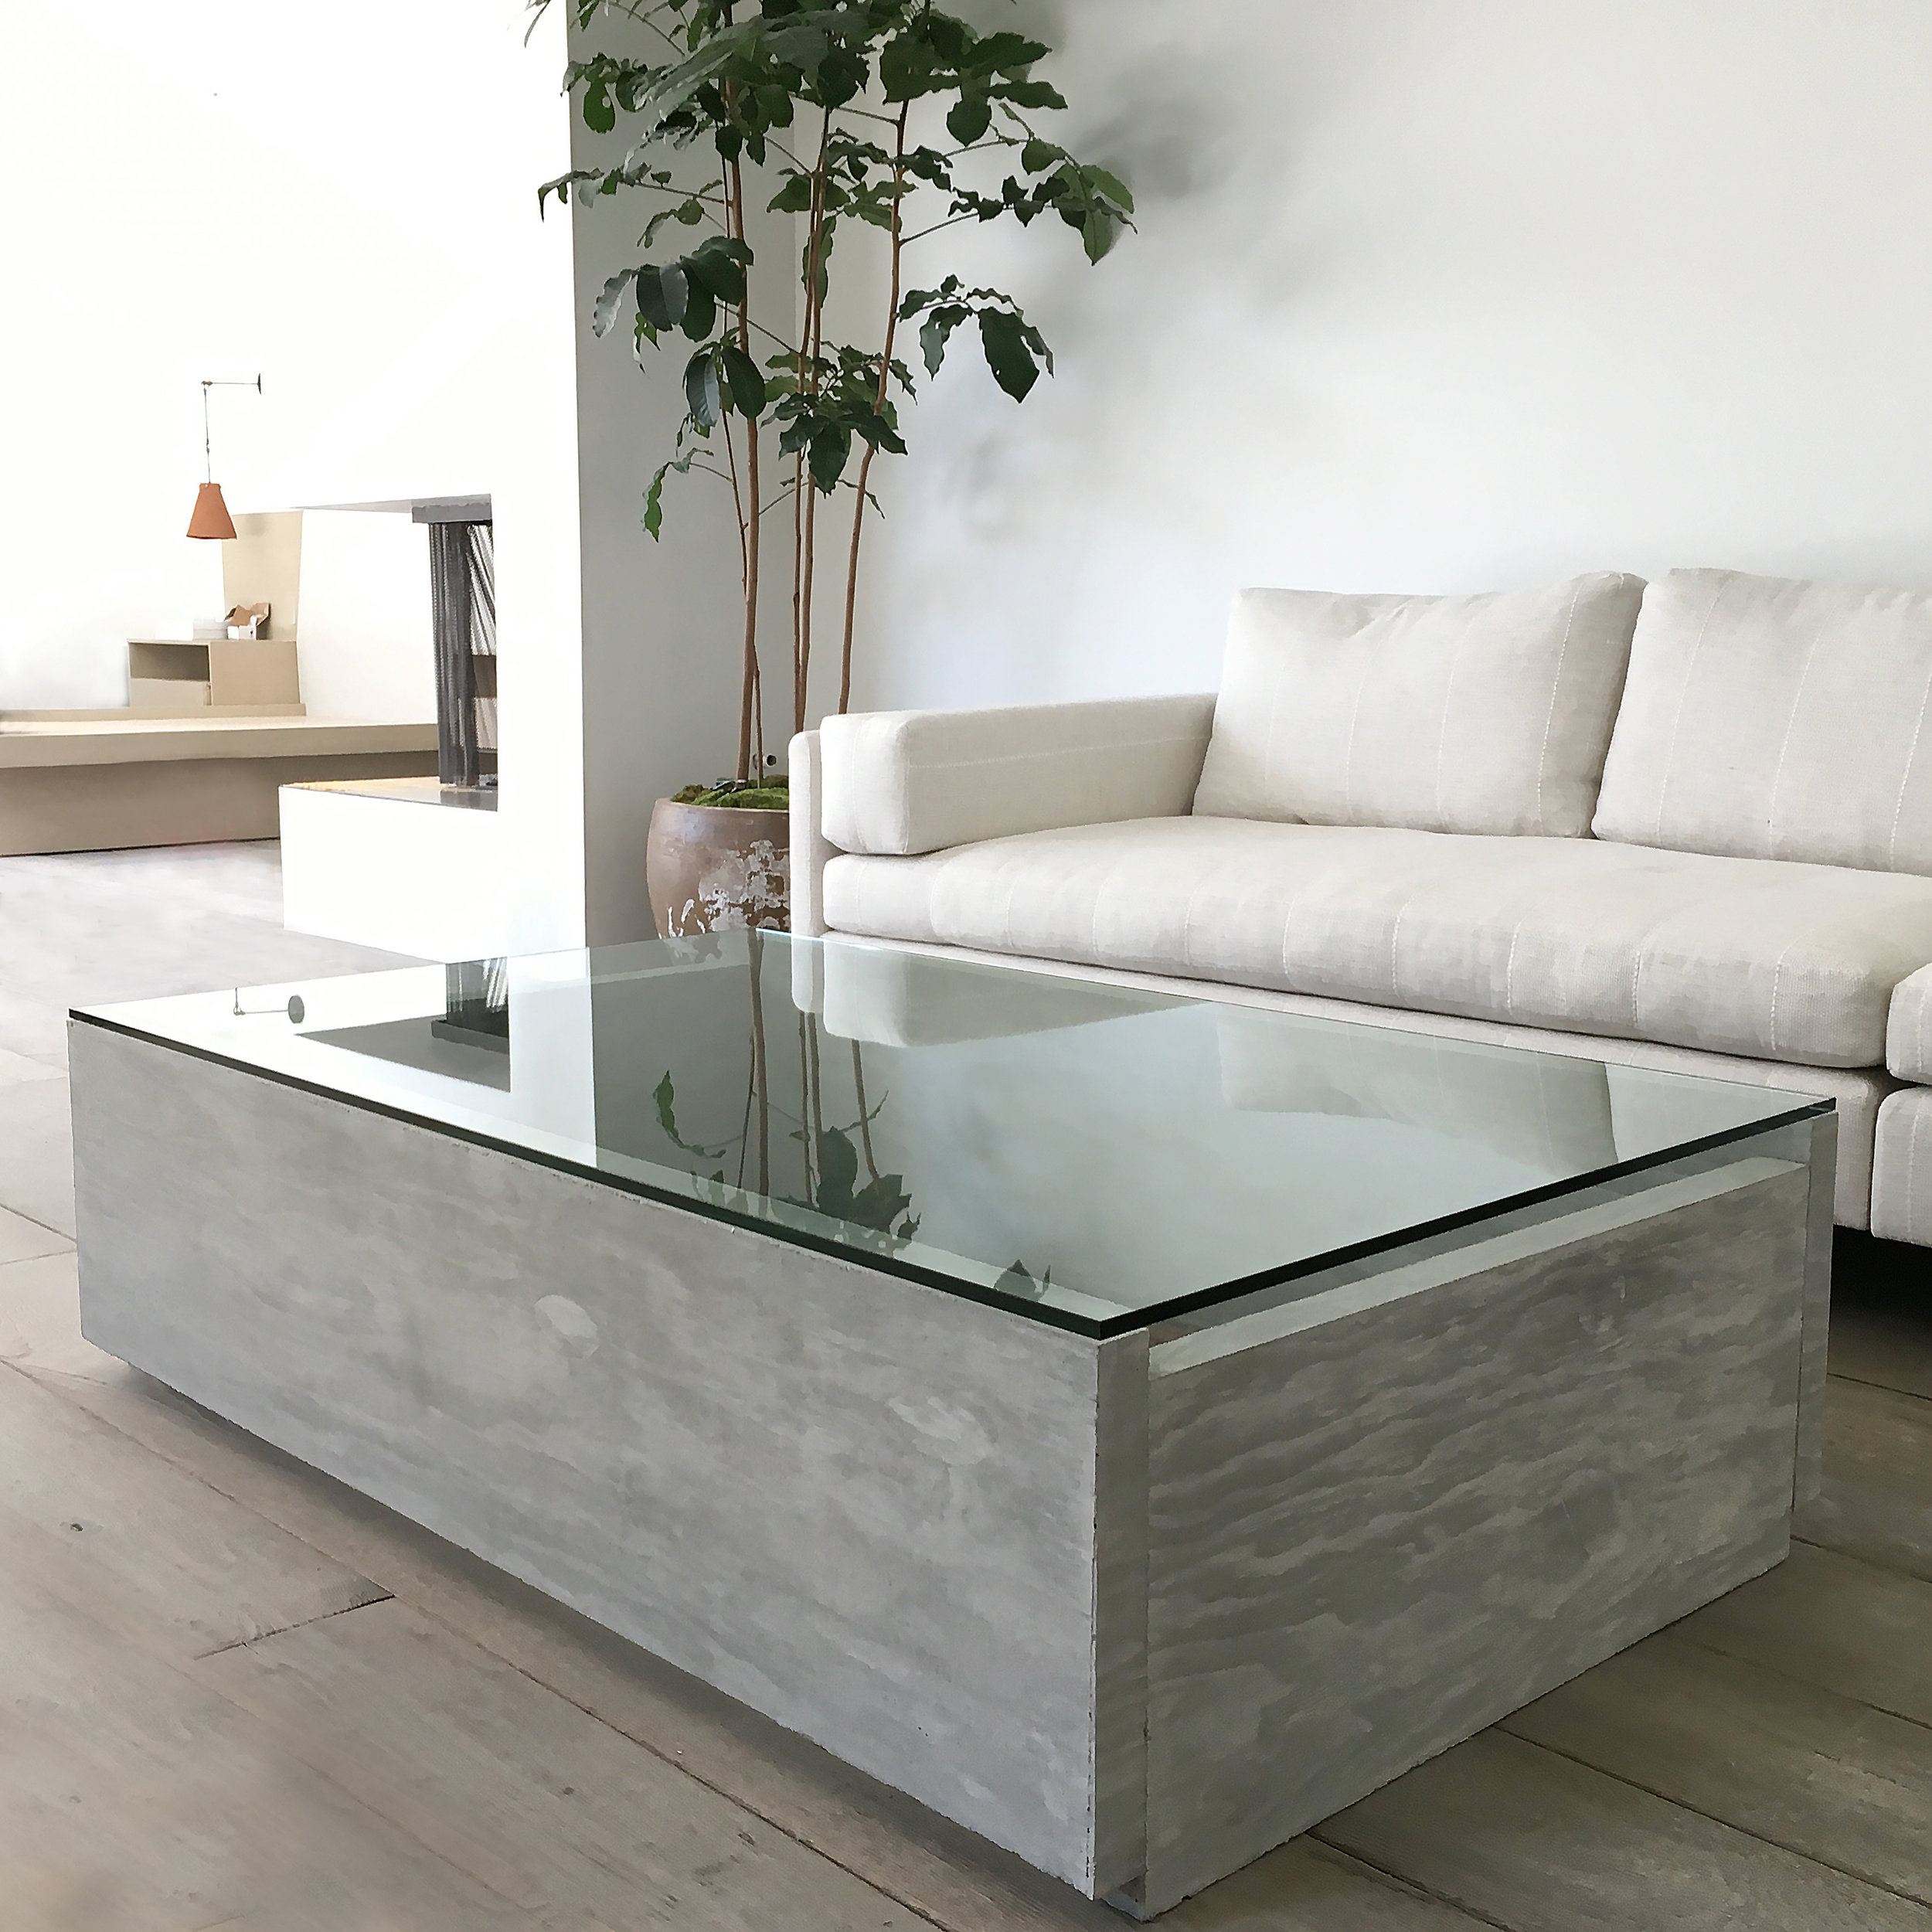 Concrete Table.jpeg